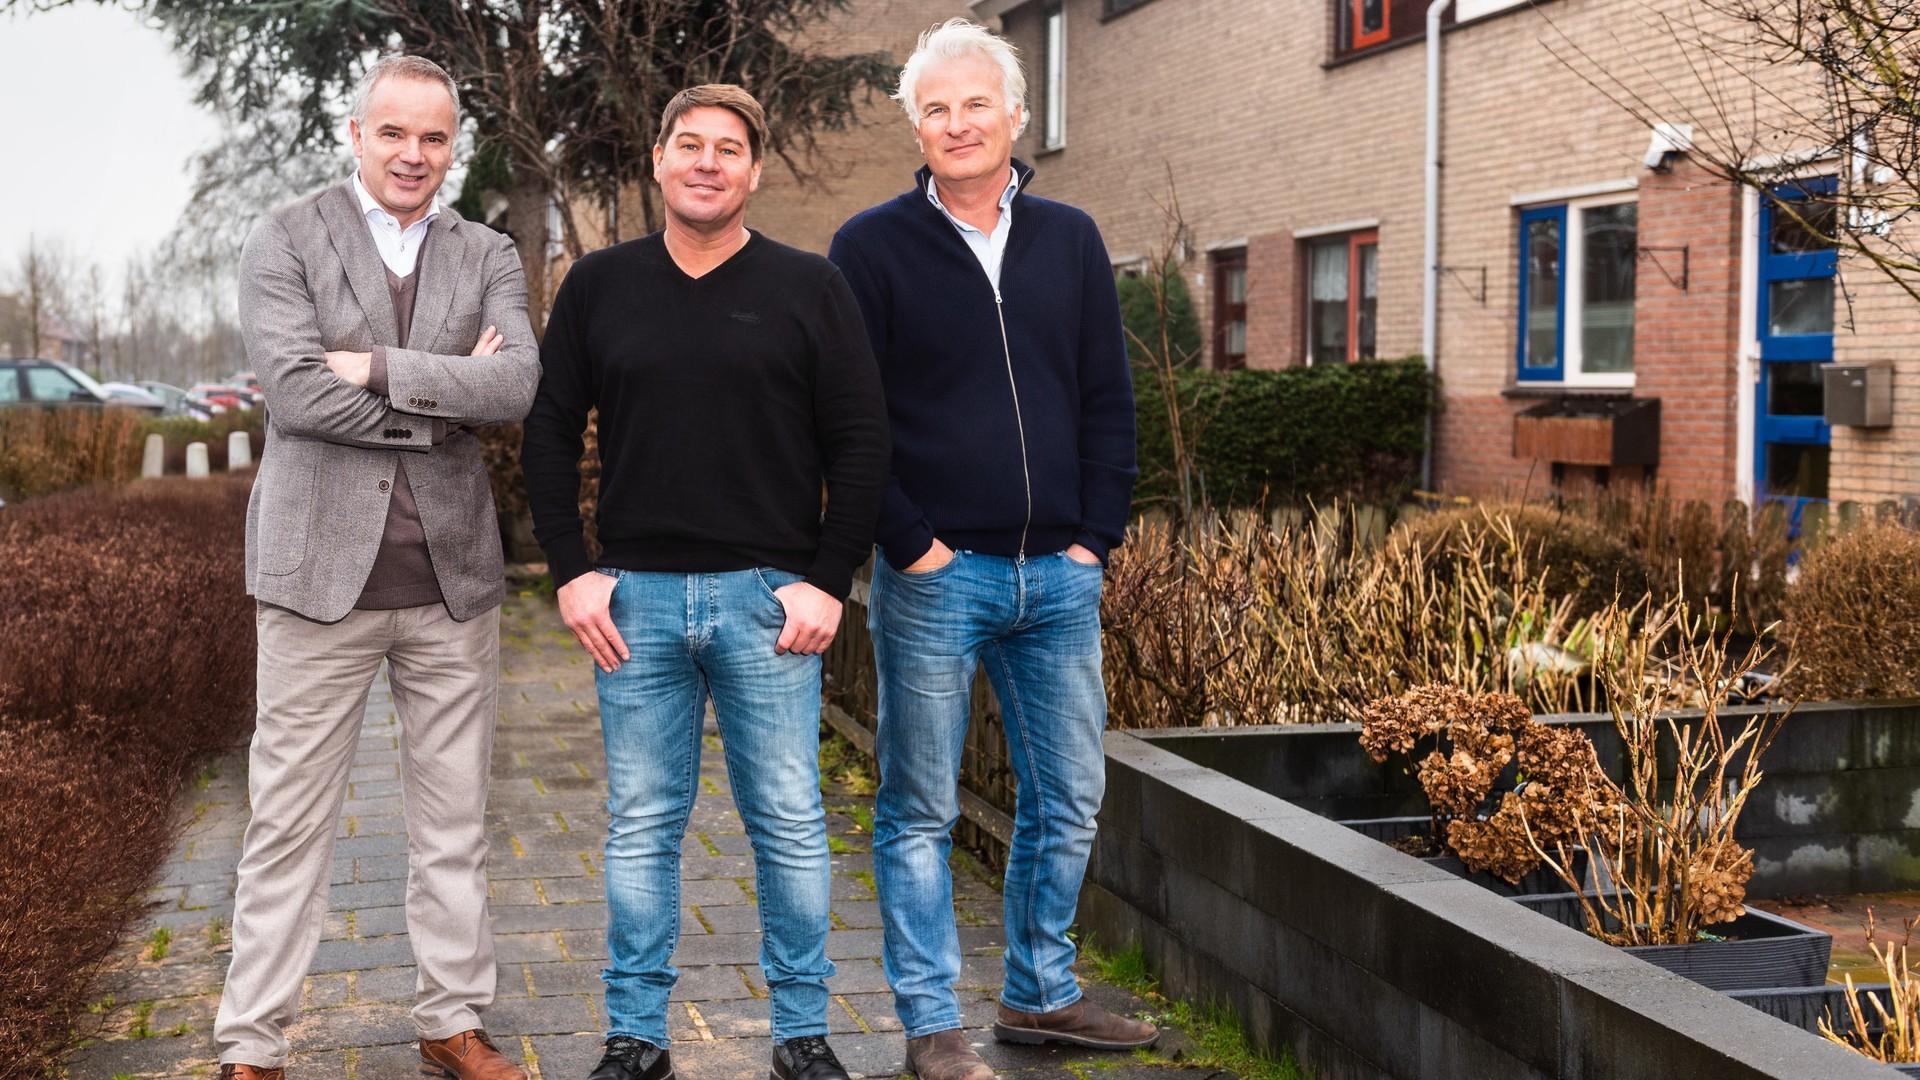 v.l.n.r.  Alex van Keulen, Martijn Krabbé, Bob Sikkes